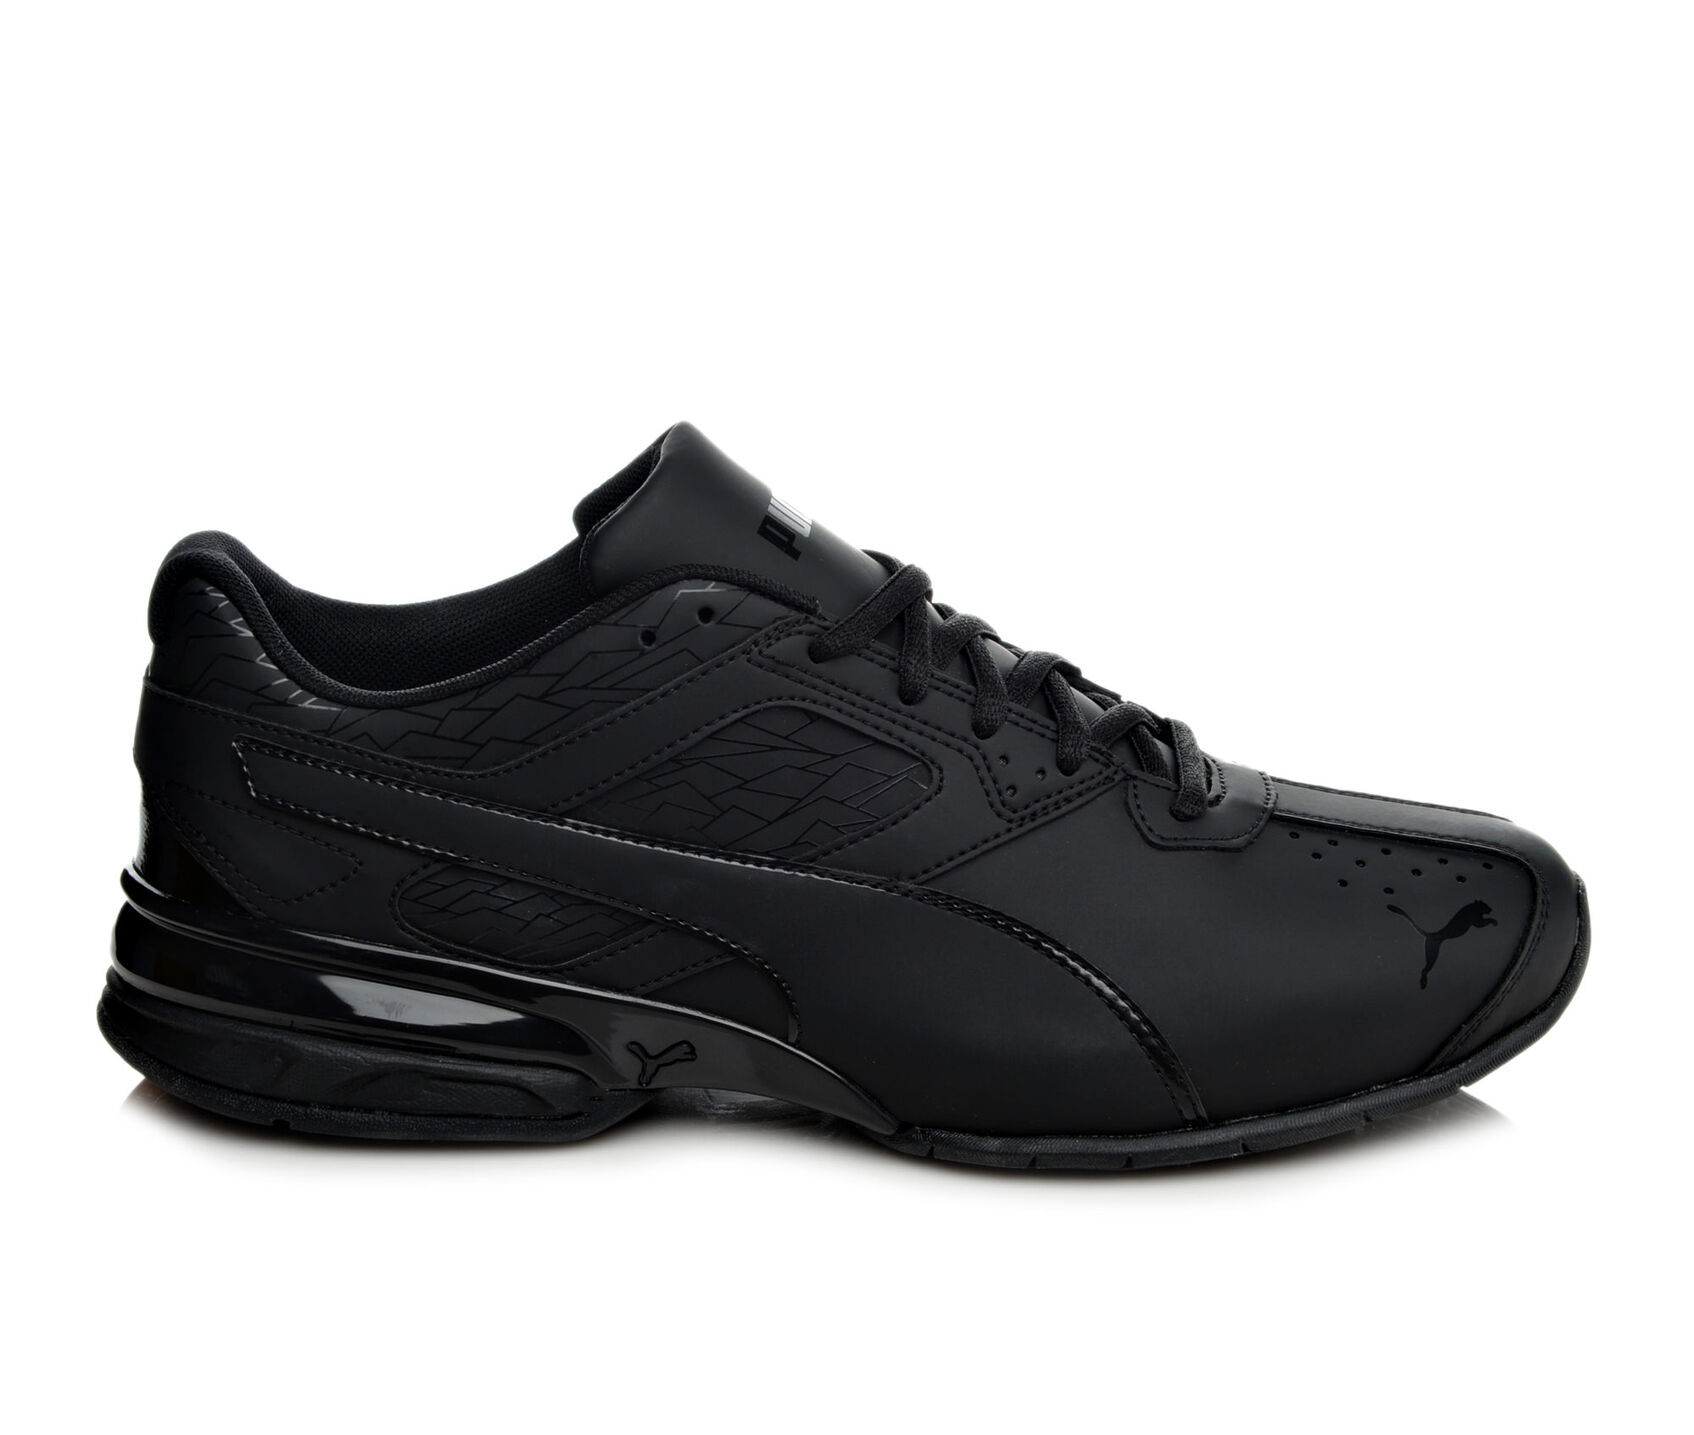 040688280f07a8 Men s Puma Tazon Fracture Sneakers